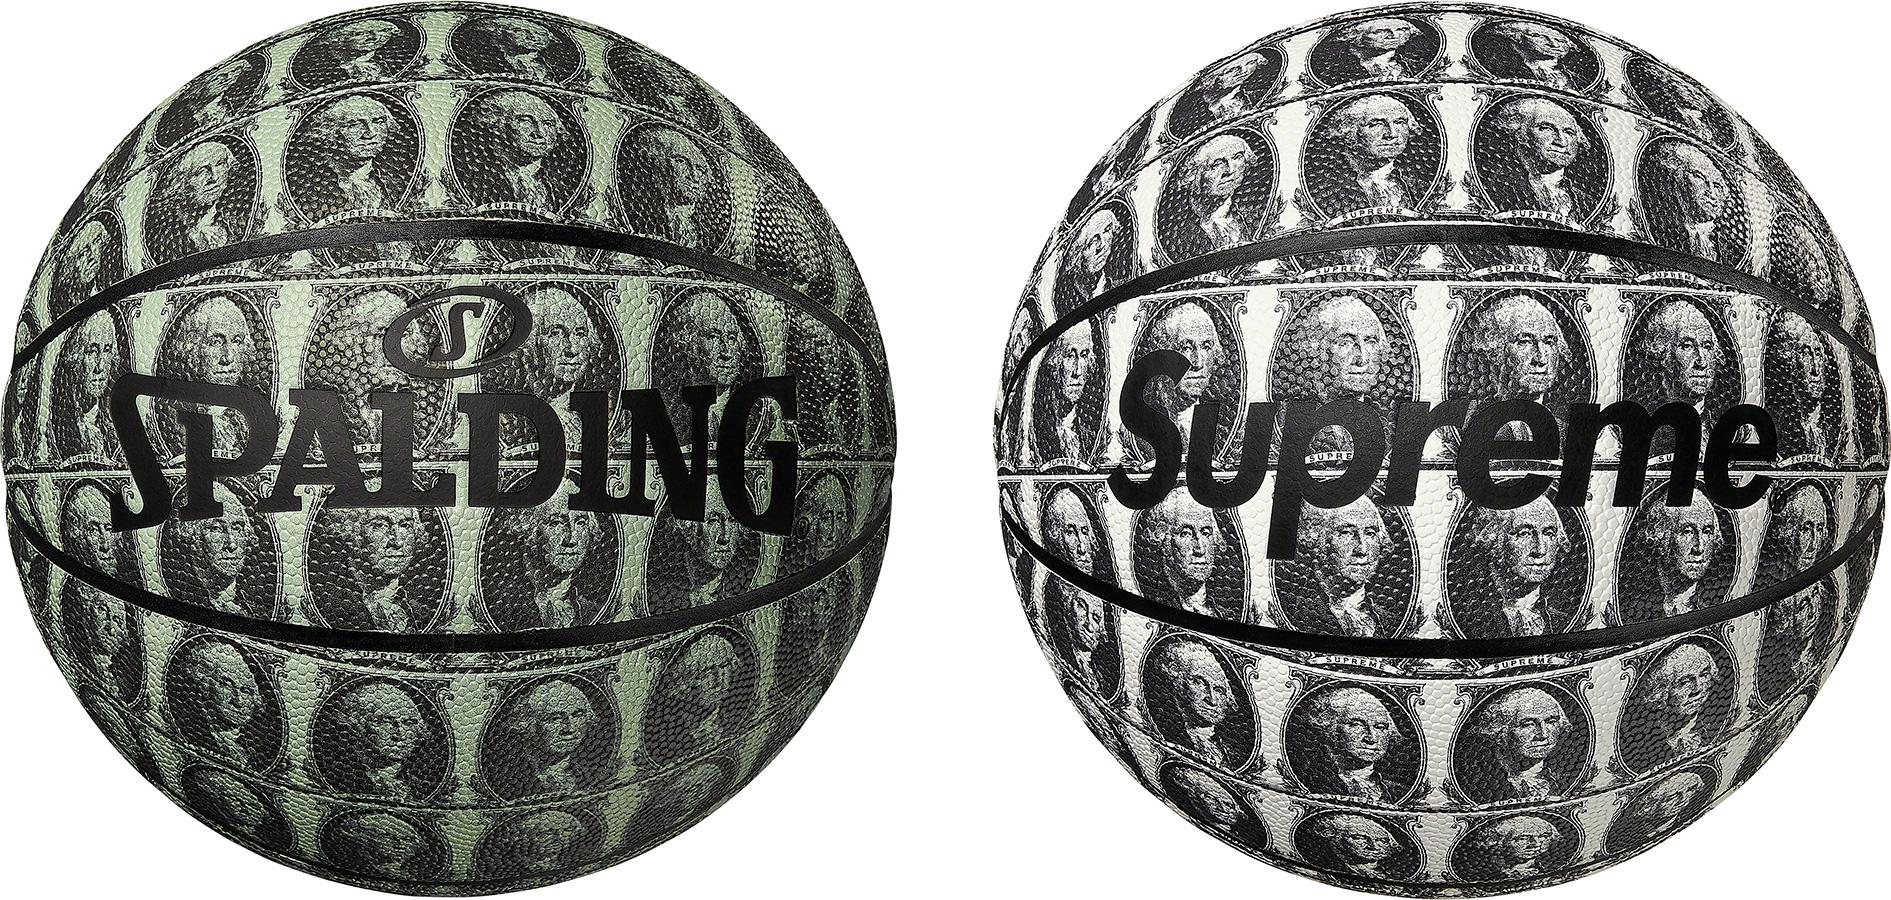 Supreme 2020fw Spalding Washington Basketball シュプリーム バスケットボール